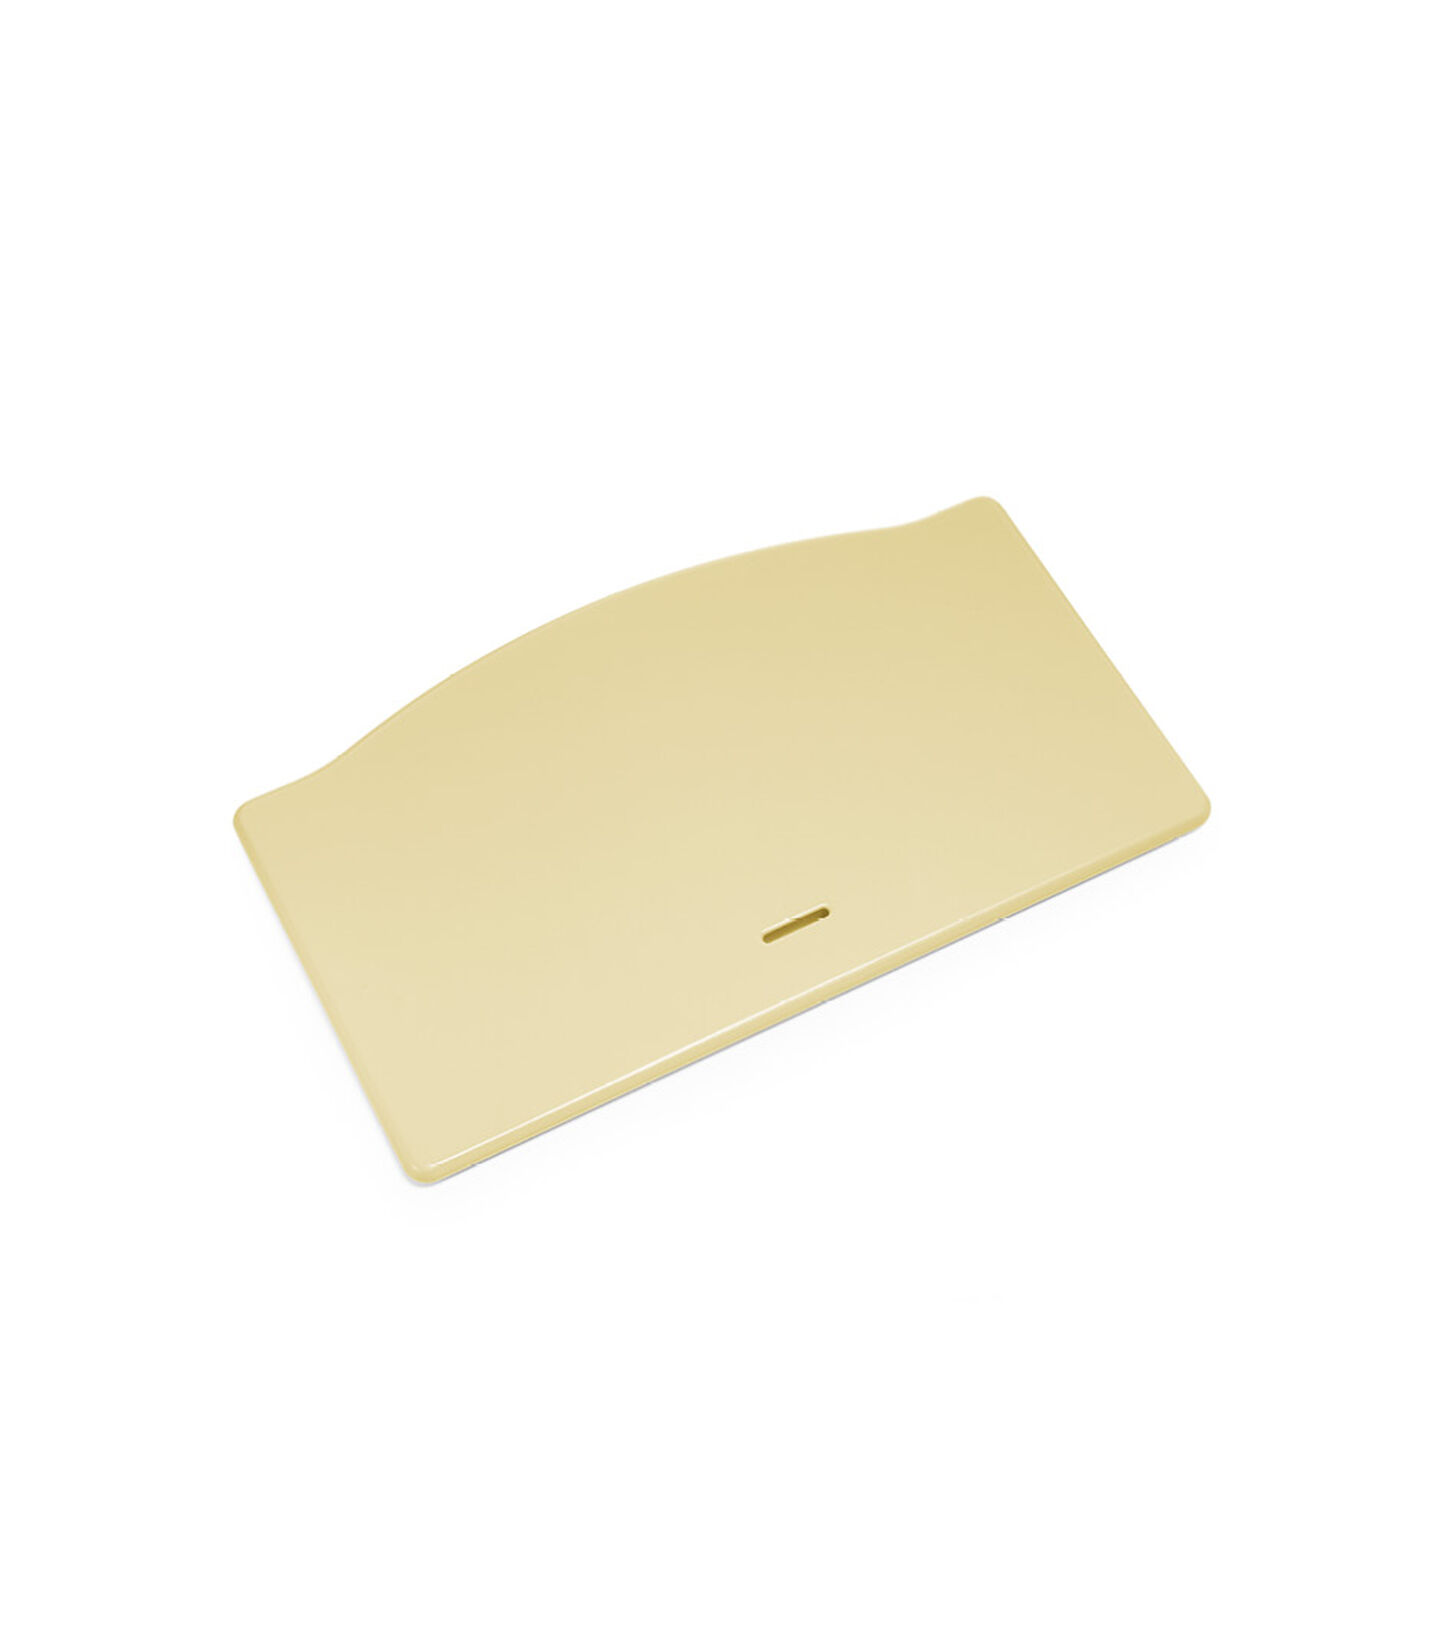 Tripp Trapp® Seatplate Wheat Yellow, Amarillo Trigo, mainview view 2